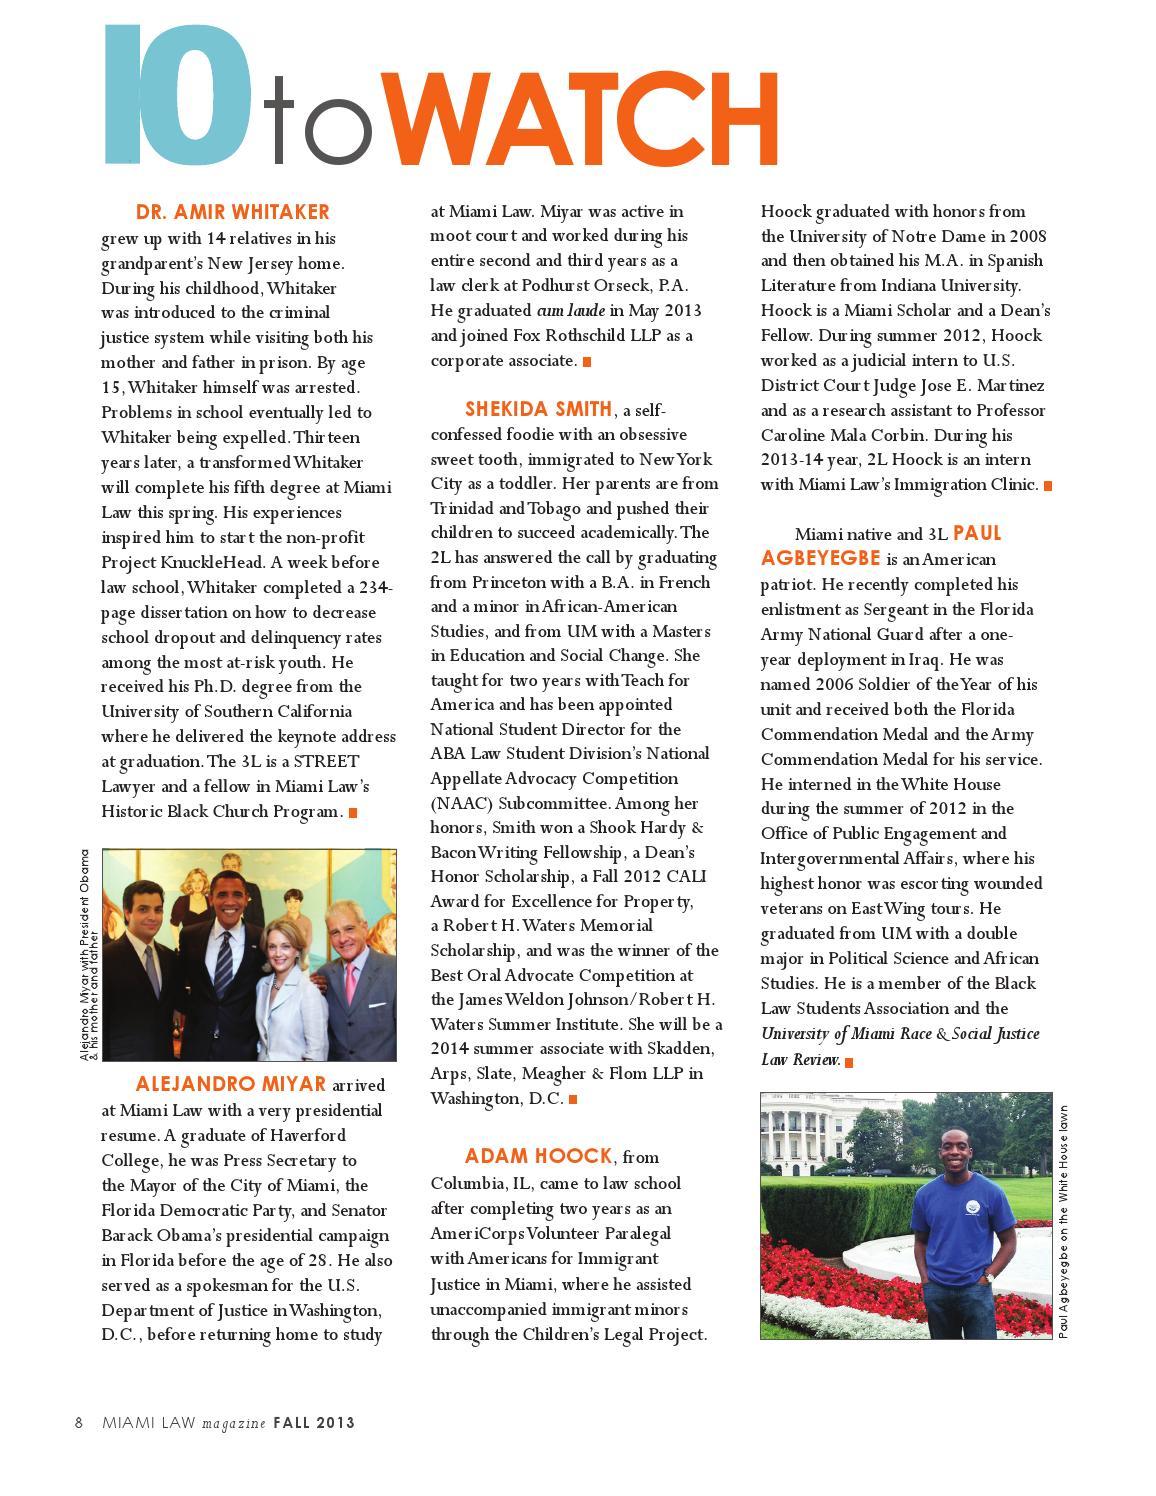 Miami Law Magazine: Fall 2013 by University of Miami School